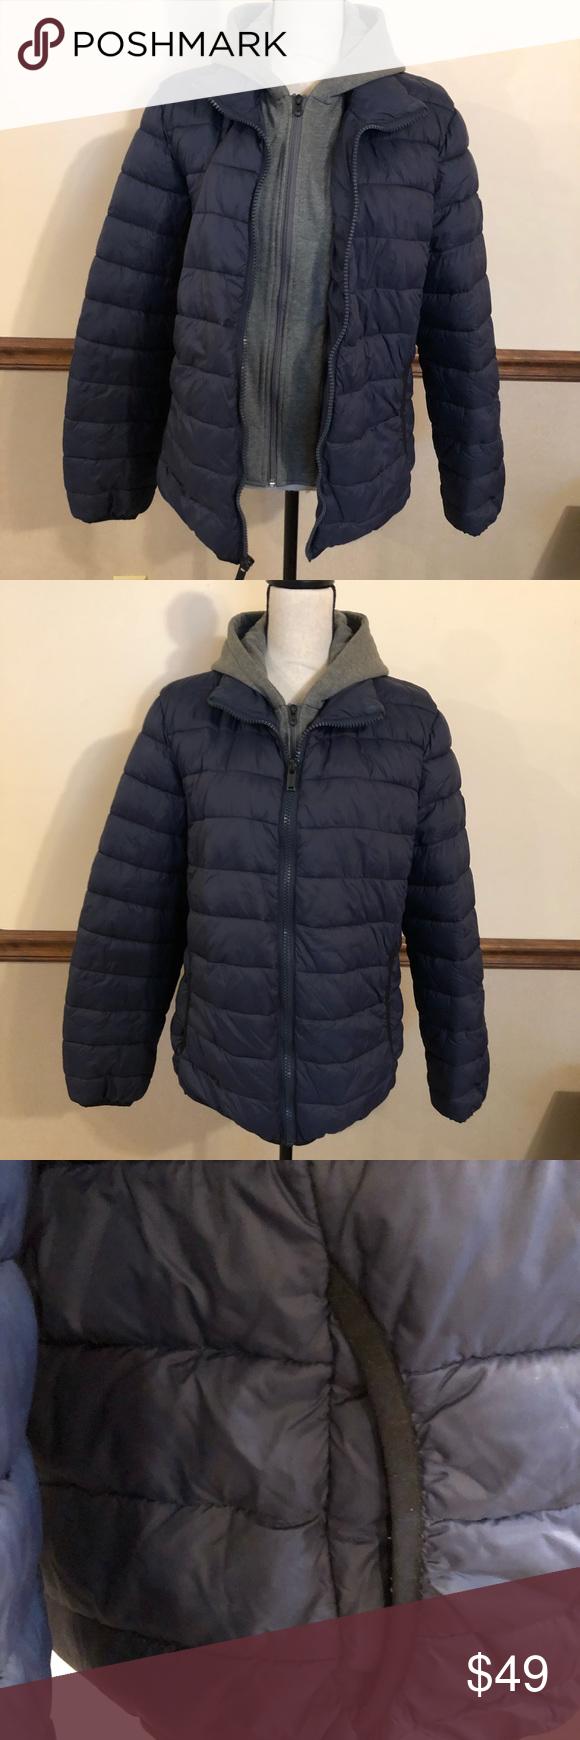 Men S Guess Hooded Puffer Jacket Winter Coat Winter Jackets Jackets Winter Coat [ 1740 x 580 Pixel ]